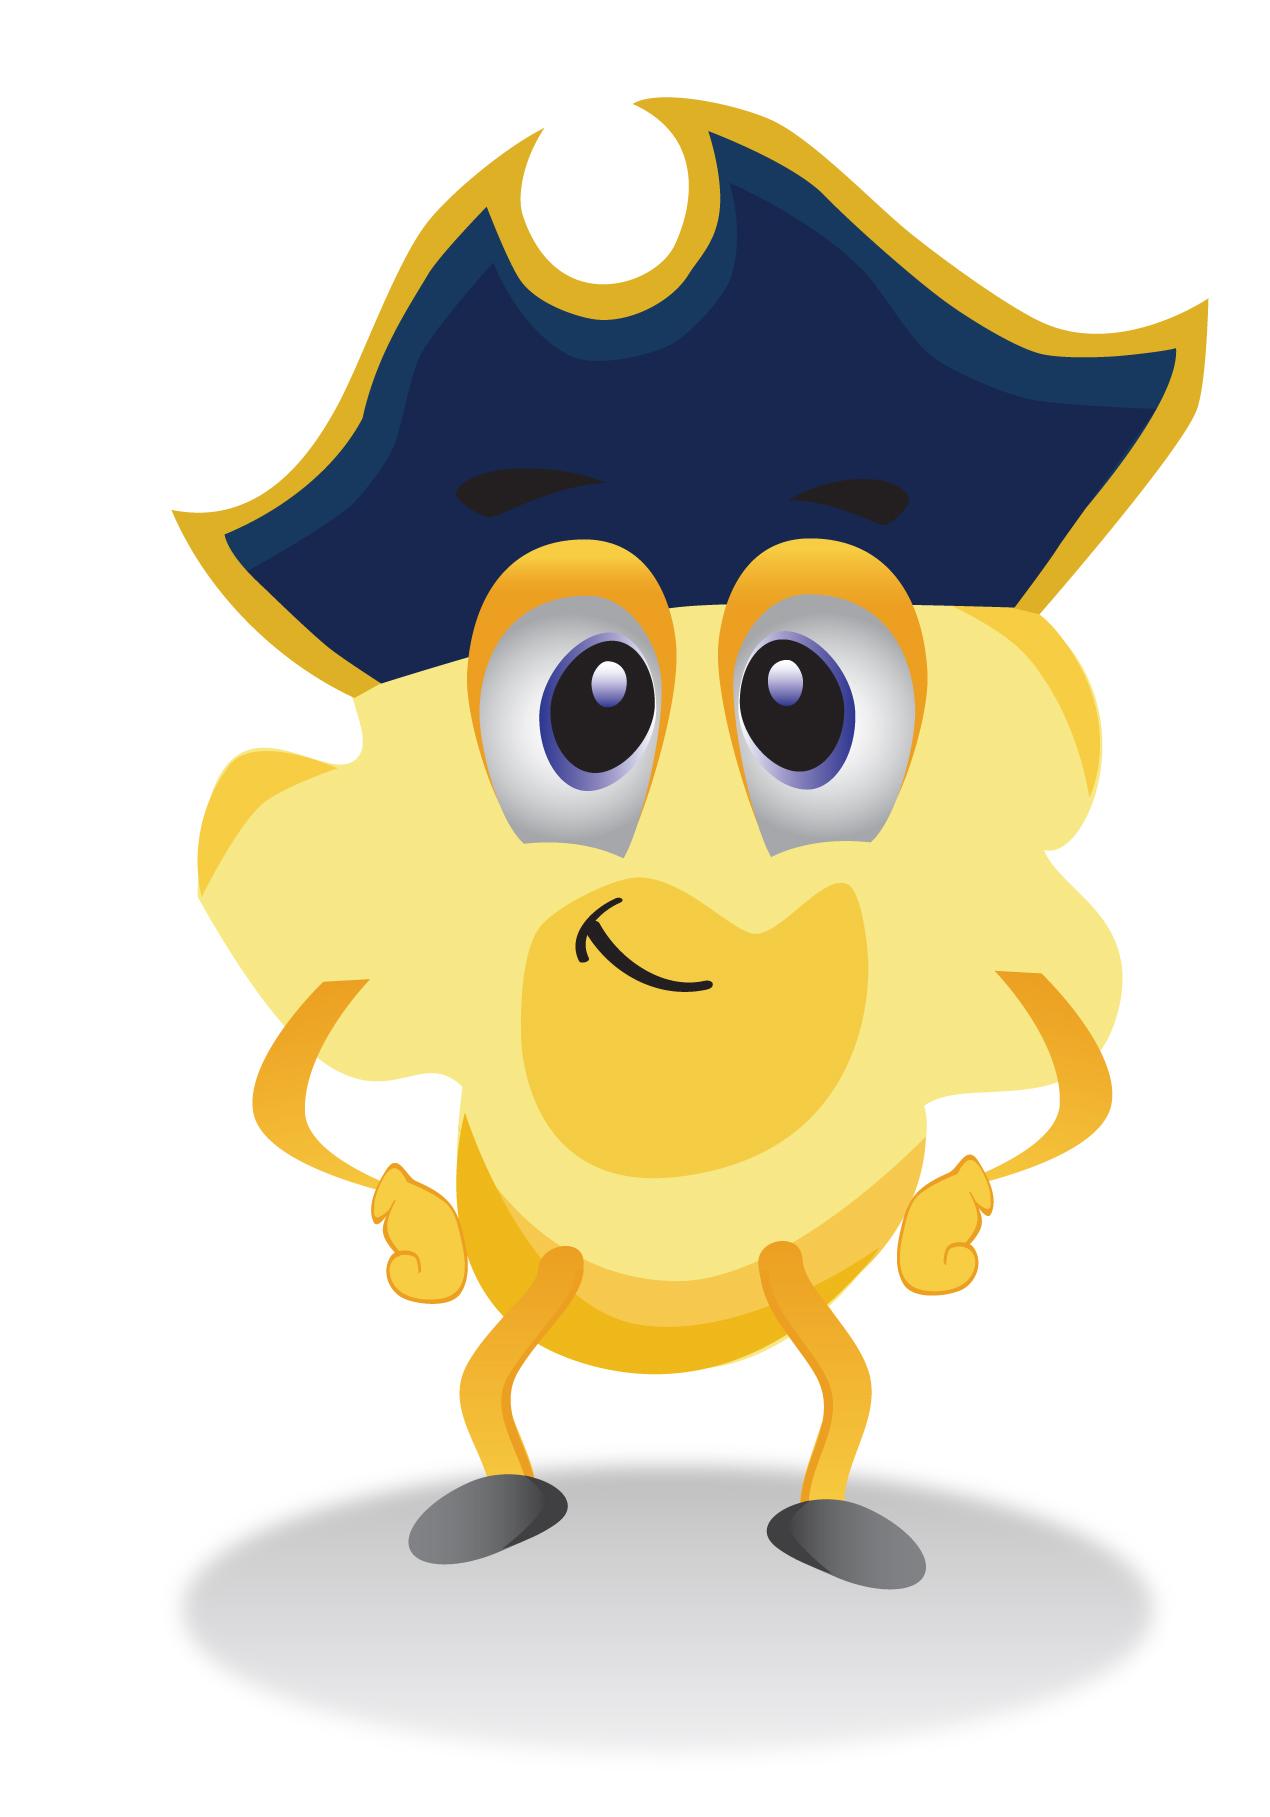 Pop Corn Mascot